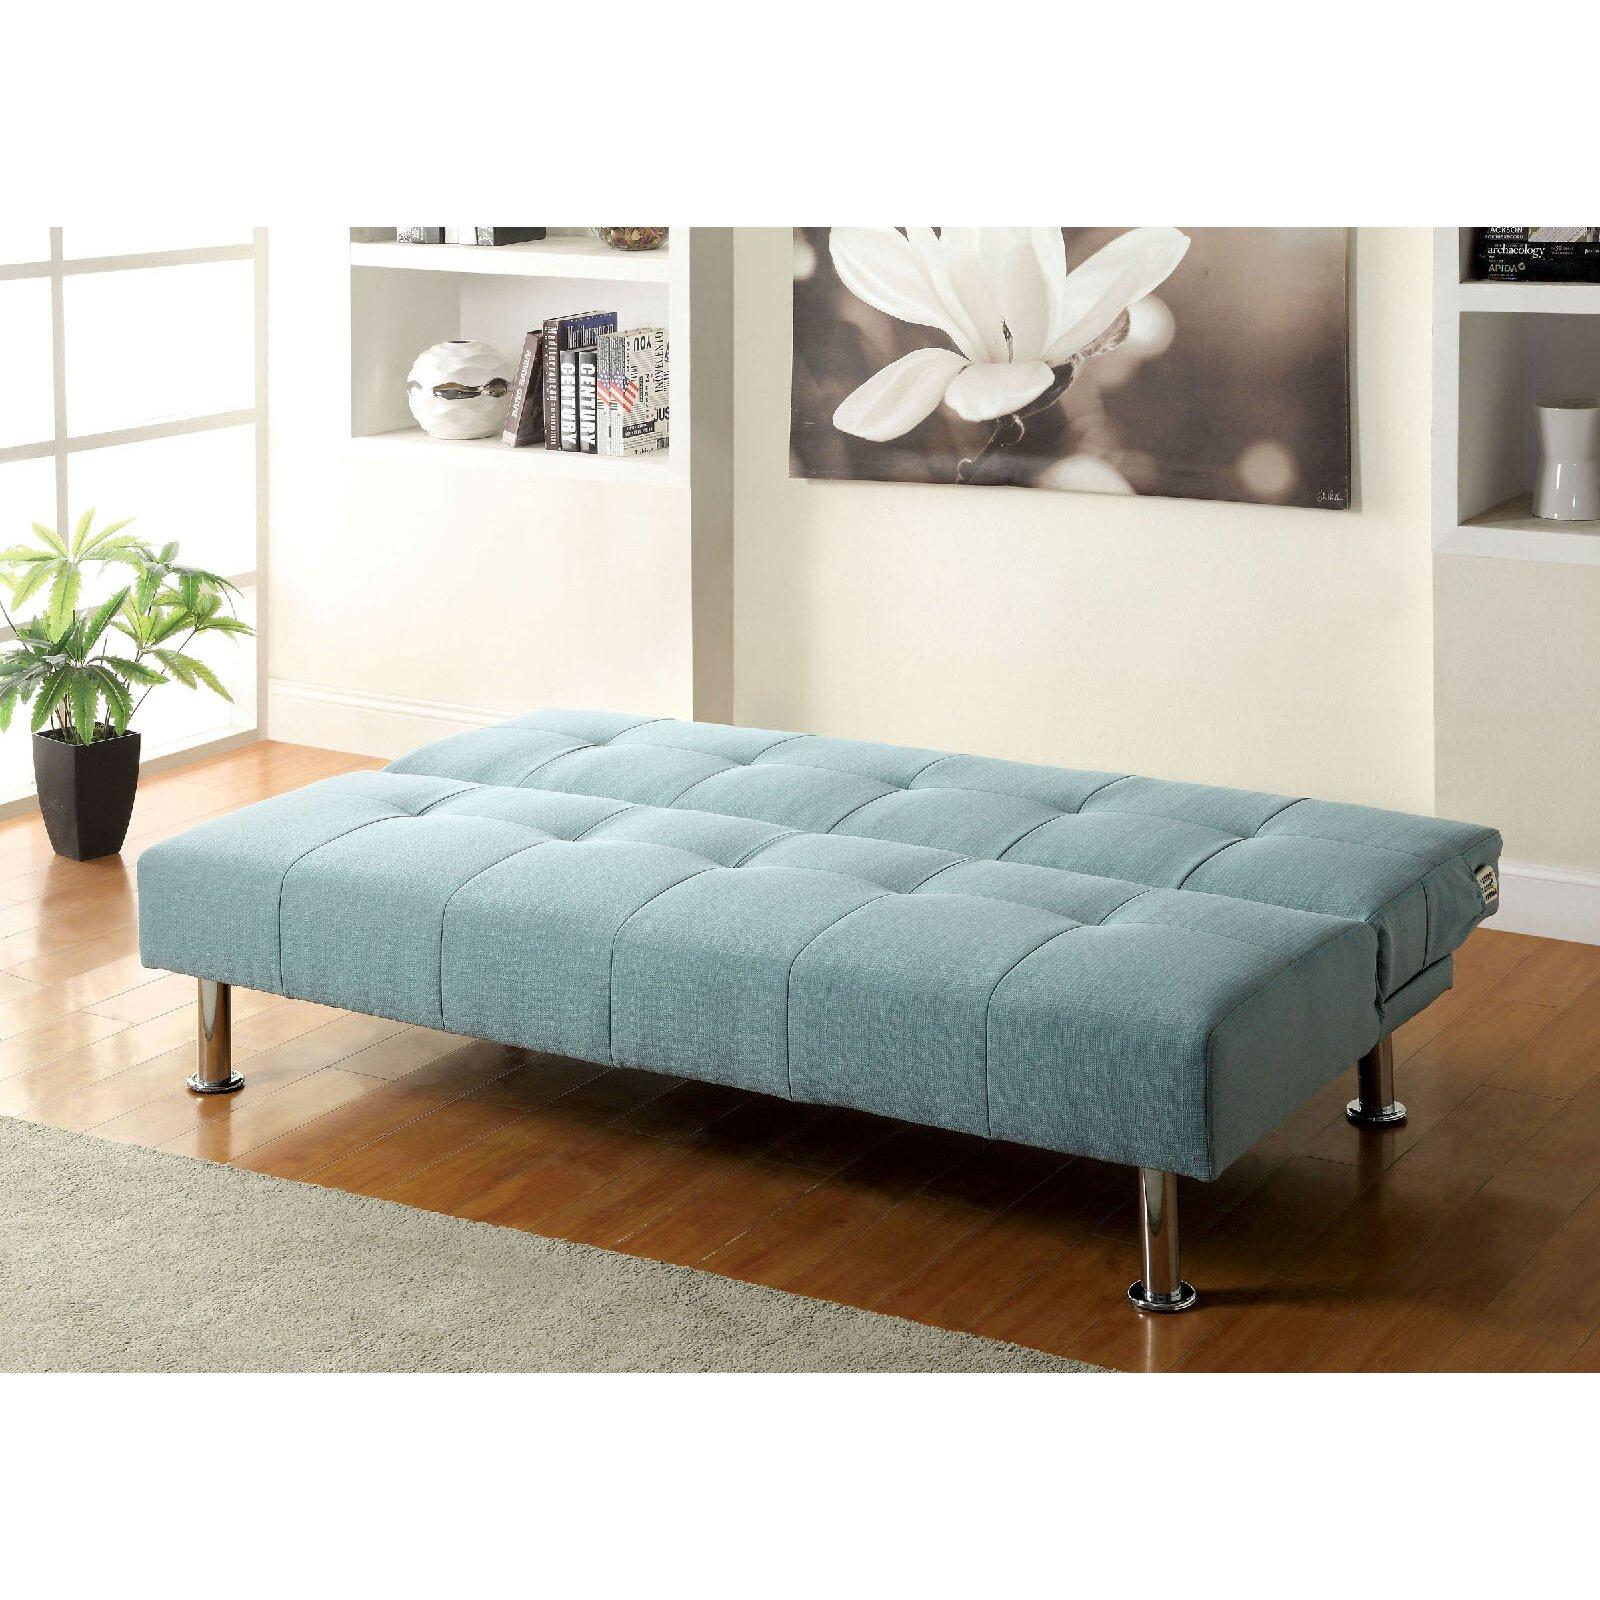 homes studio tufted futon sleeper sofa reviews wayfair